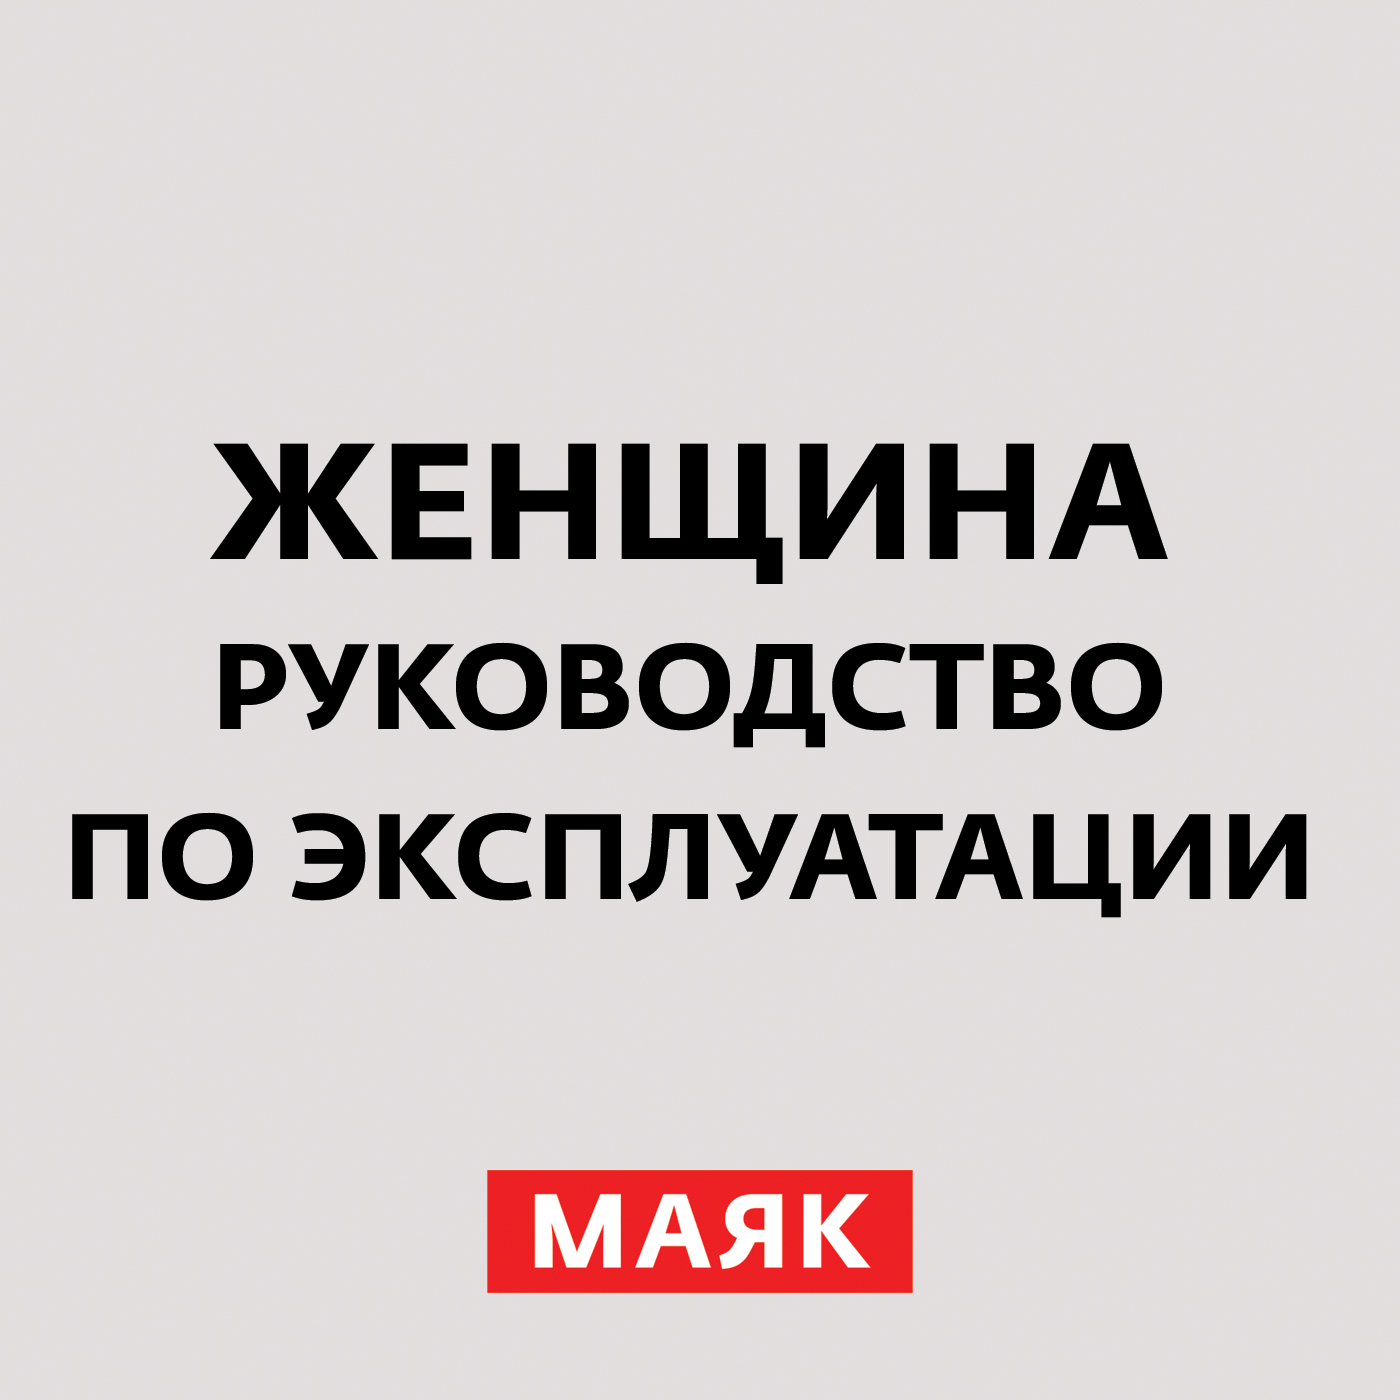 Творческий коллектив радио «Маяк» Женщина – секс-символ творческий коллектив радио маяк женский глянец